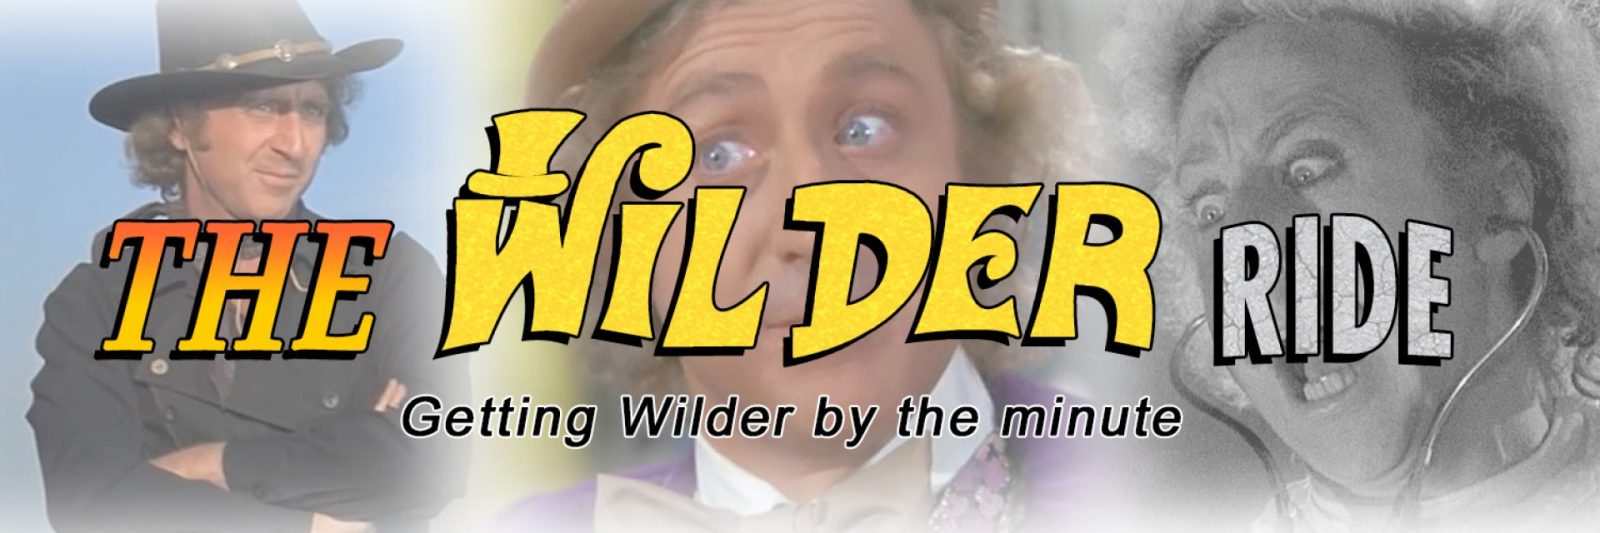 cropped-the-wilder-ride-header-with-headshots.jpg